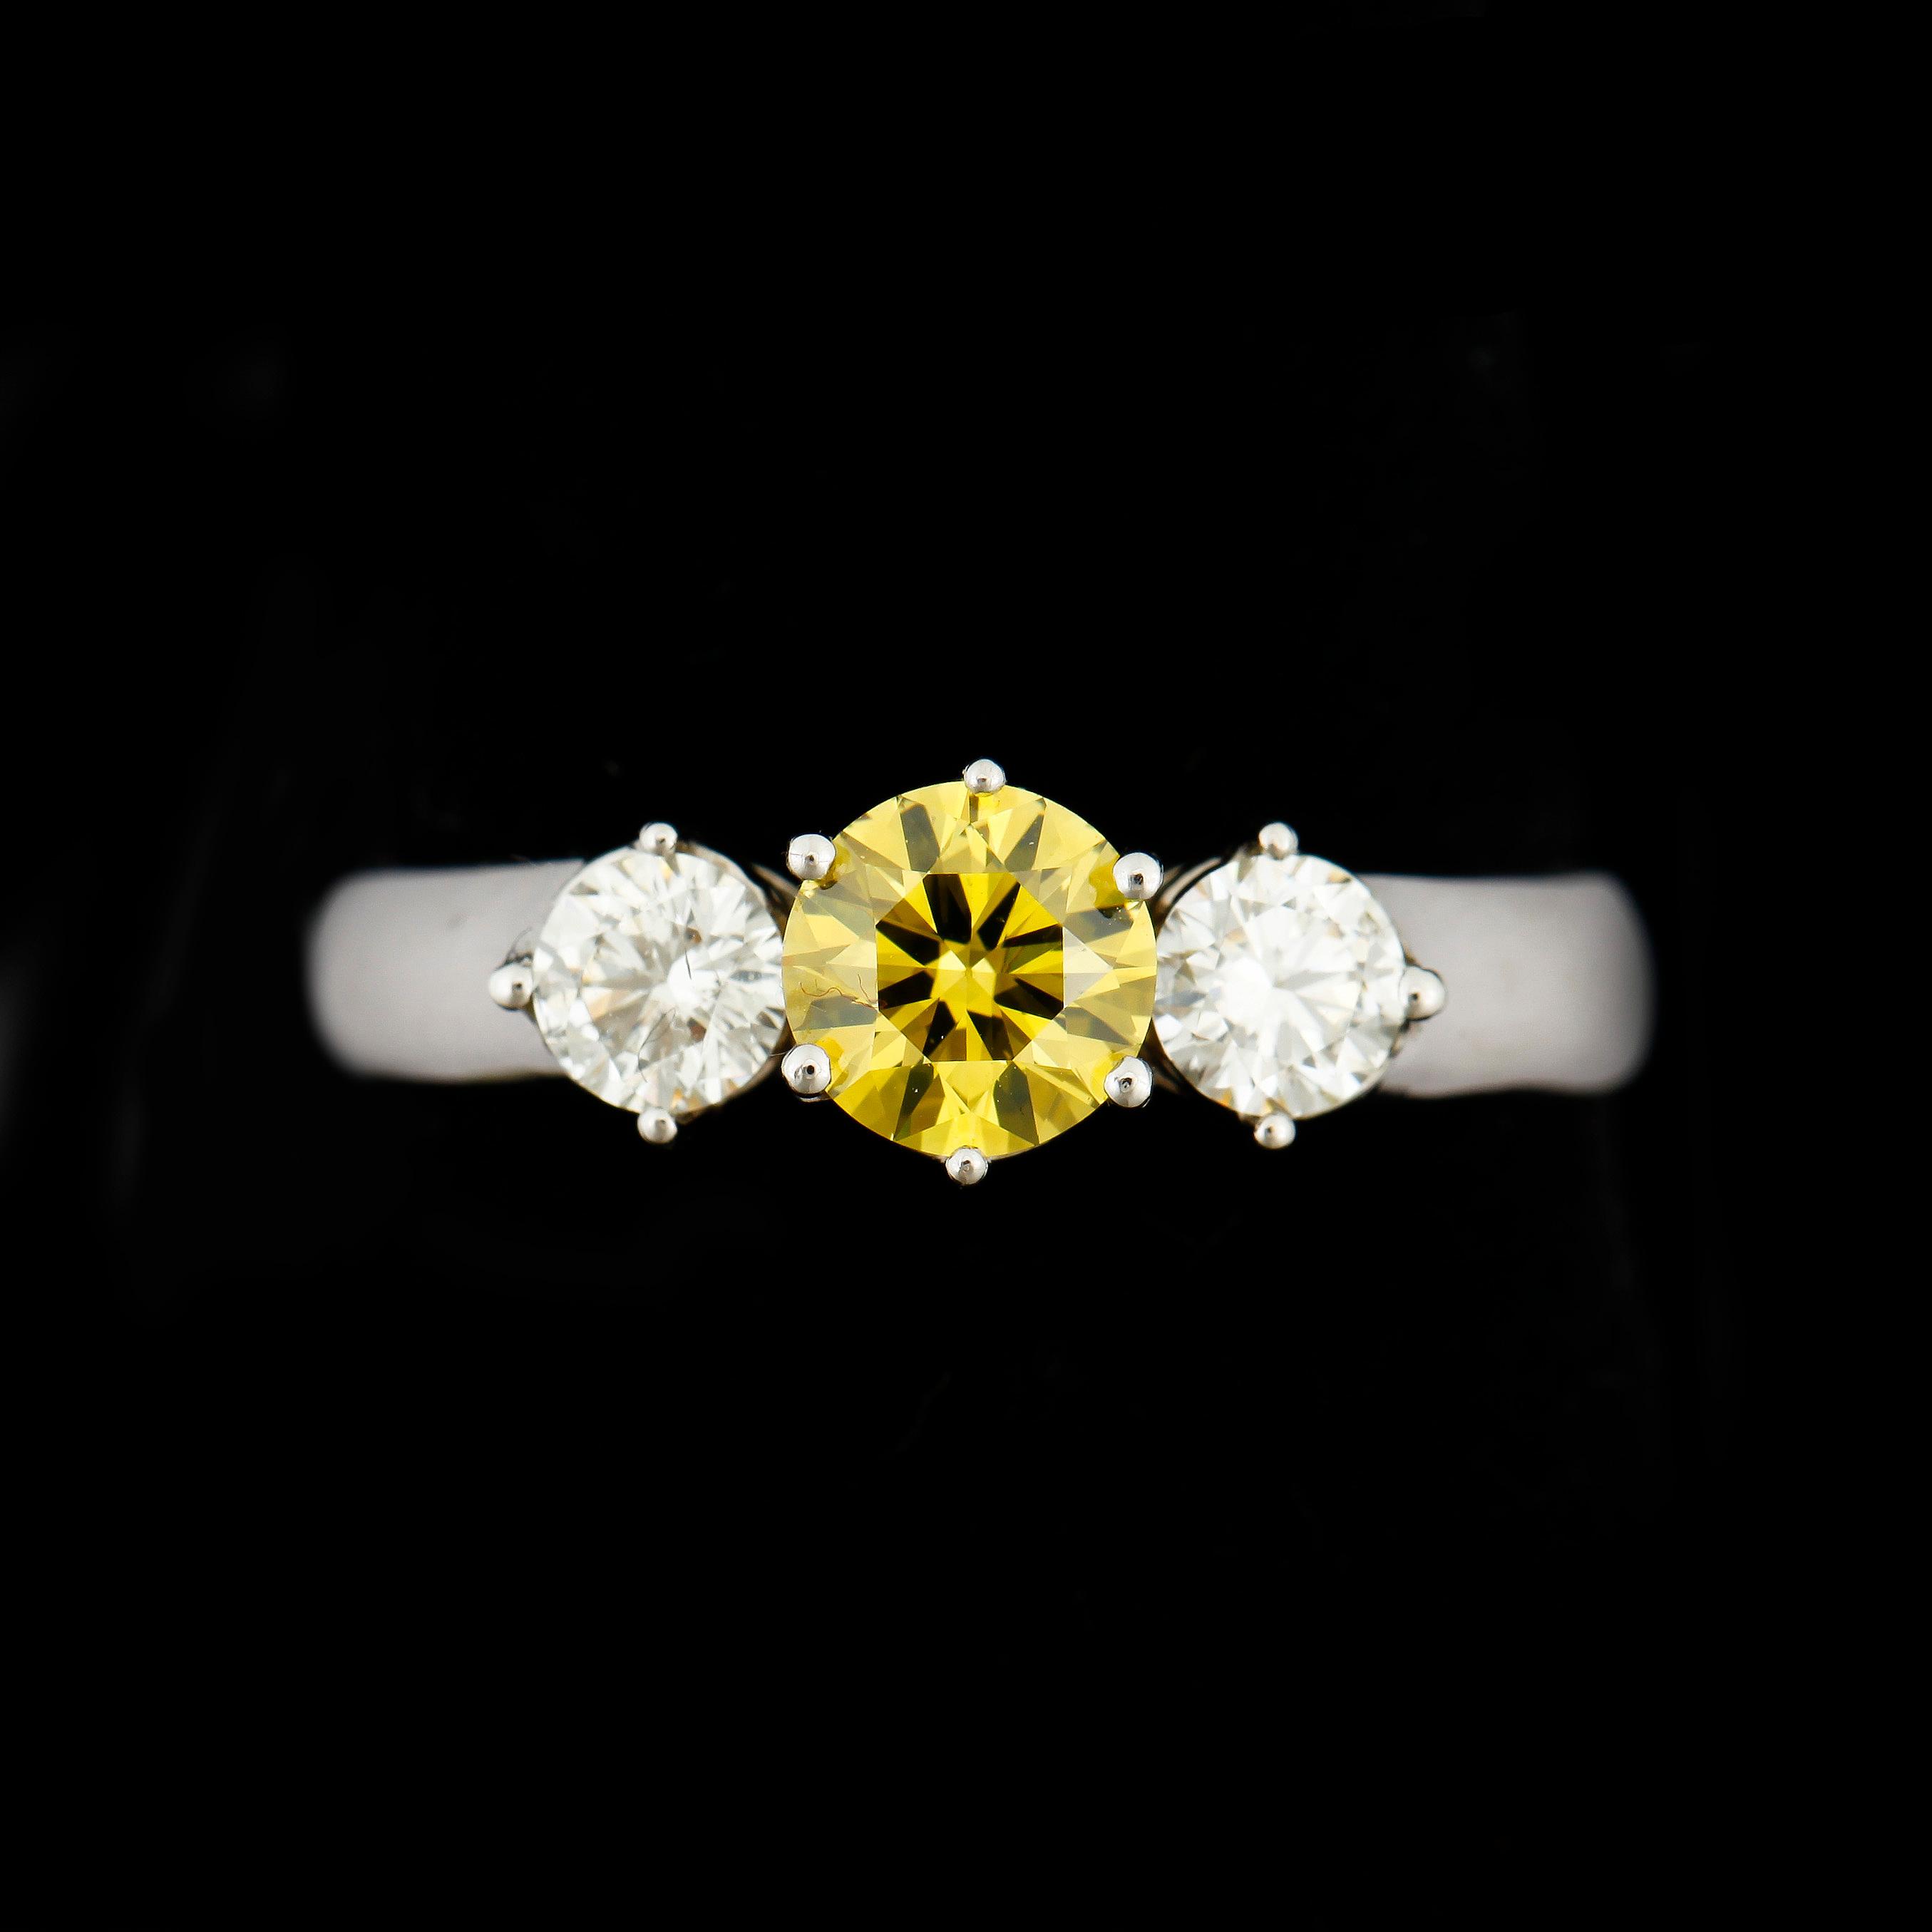 5e65348b6d80 RING, 18k vitguld med briljantslipade diamanter, mittsten gul ...